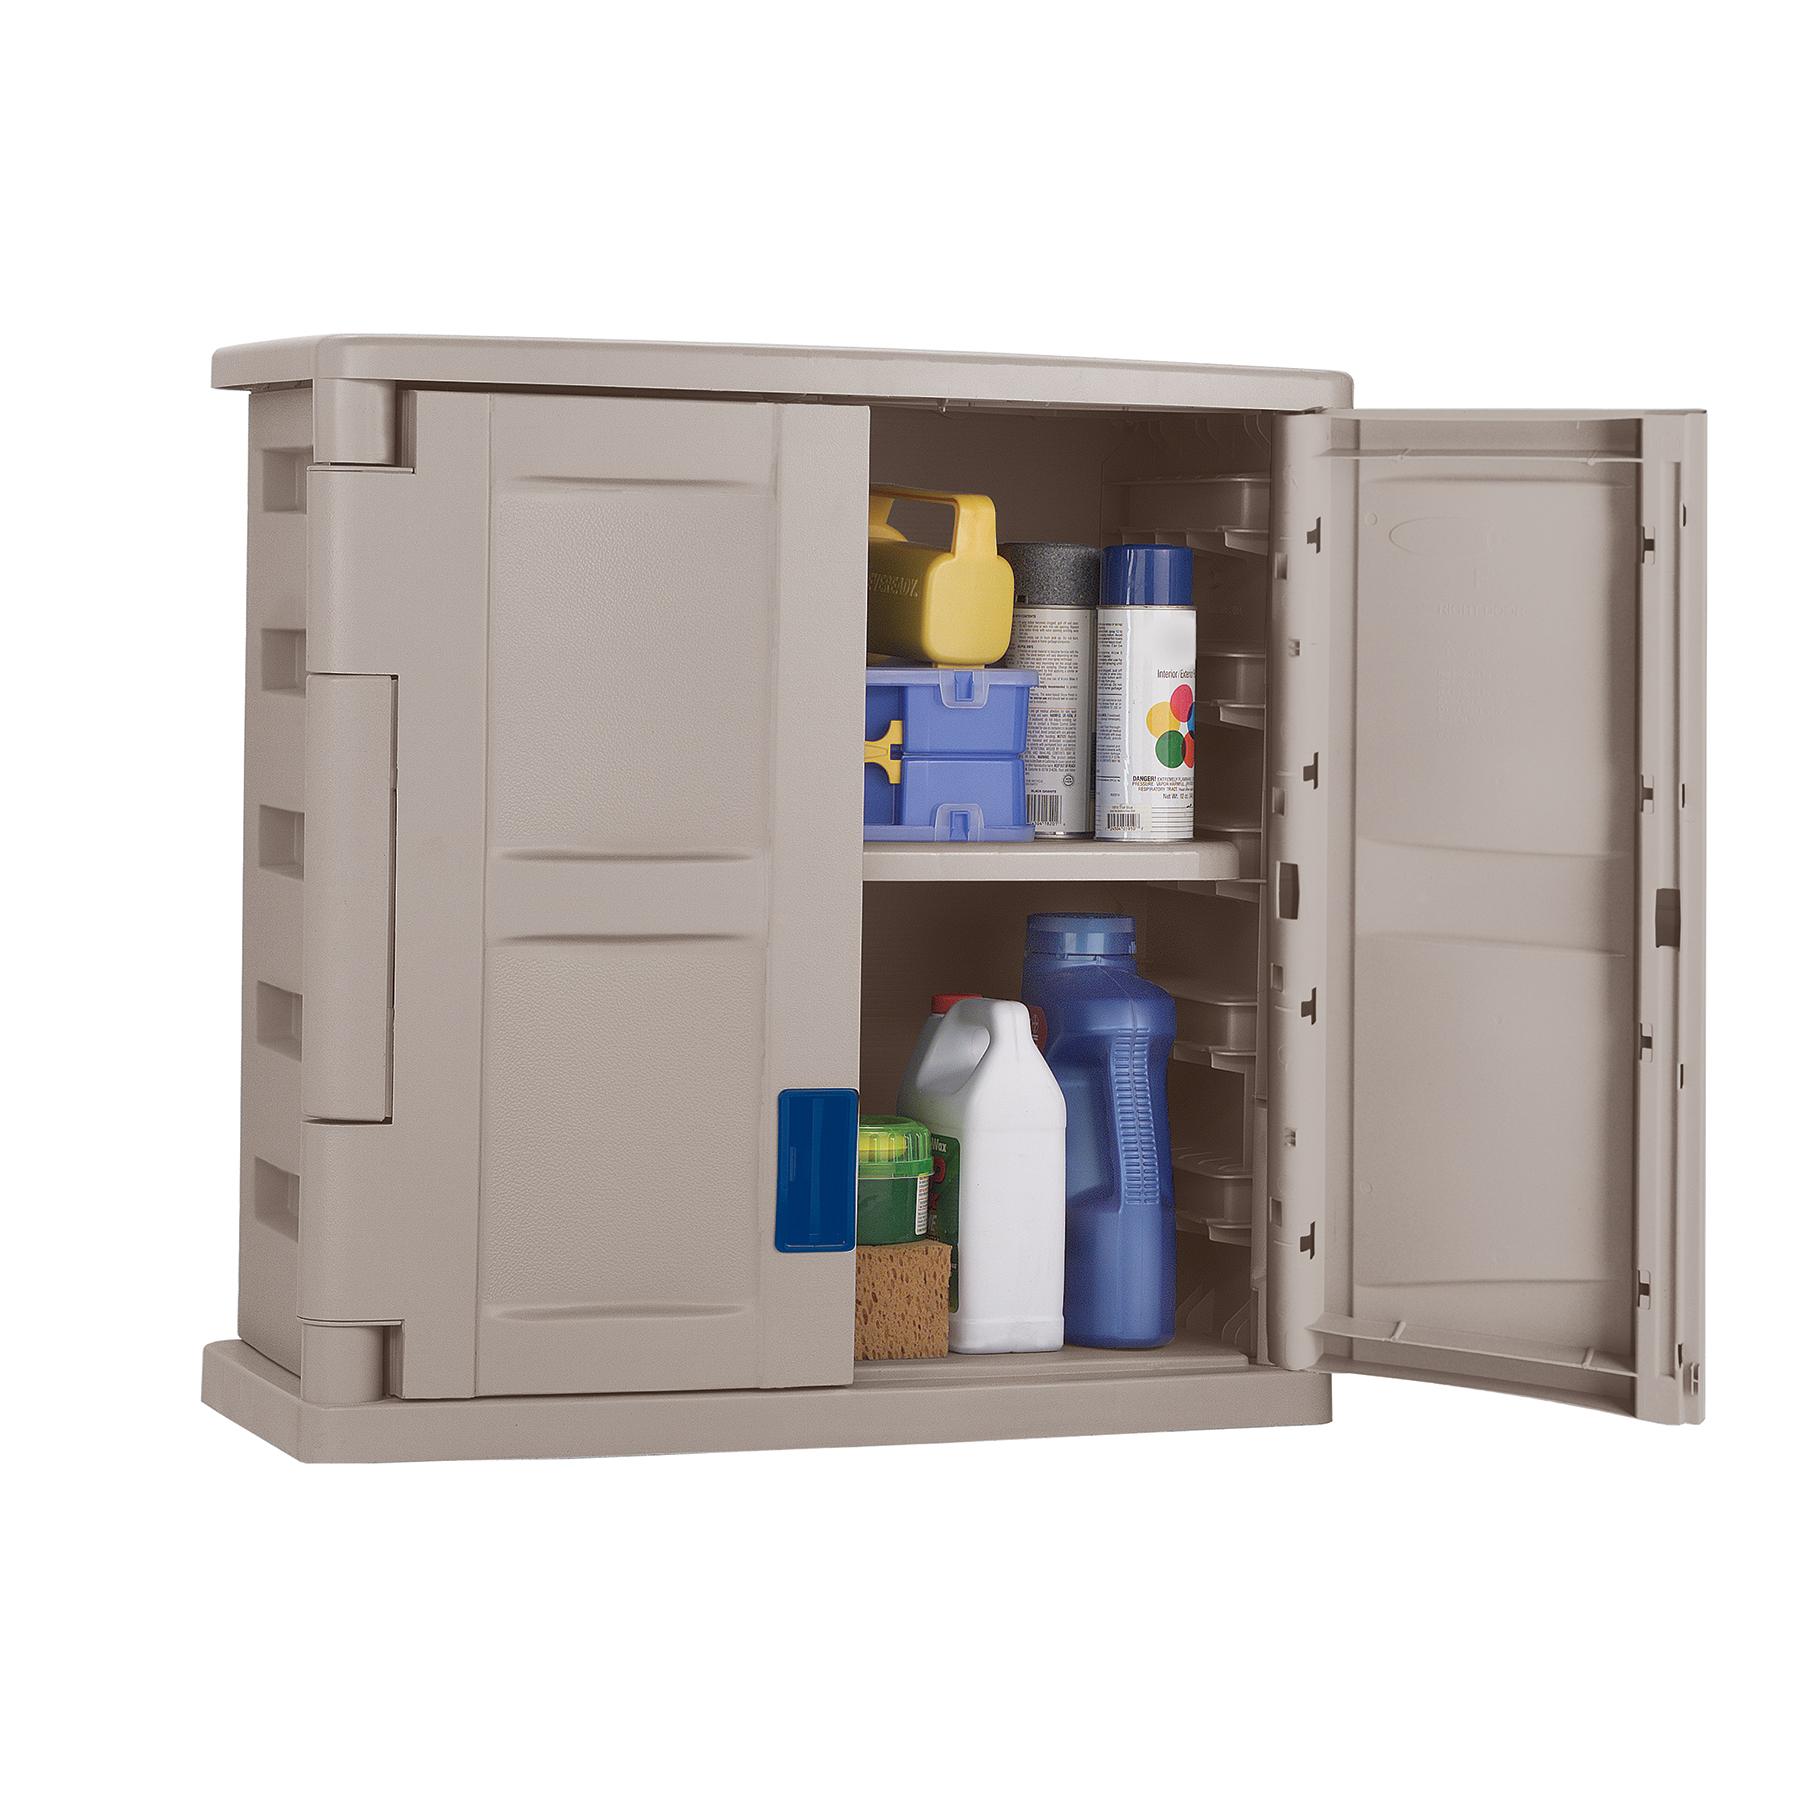 Suncast Two Door Utility Wall Cabinet